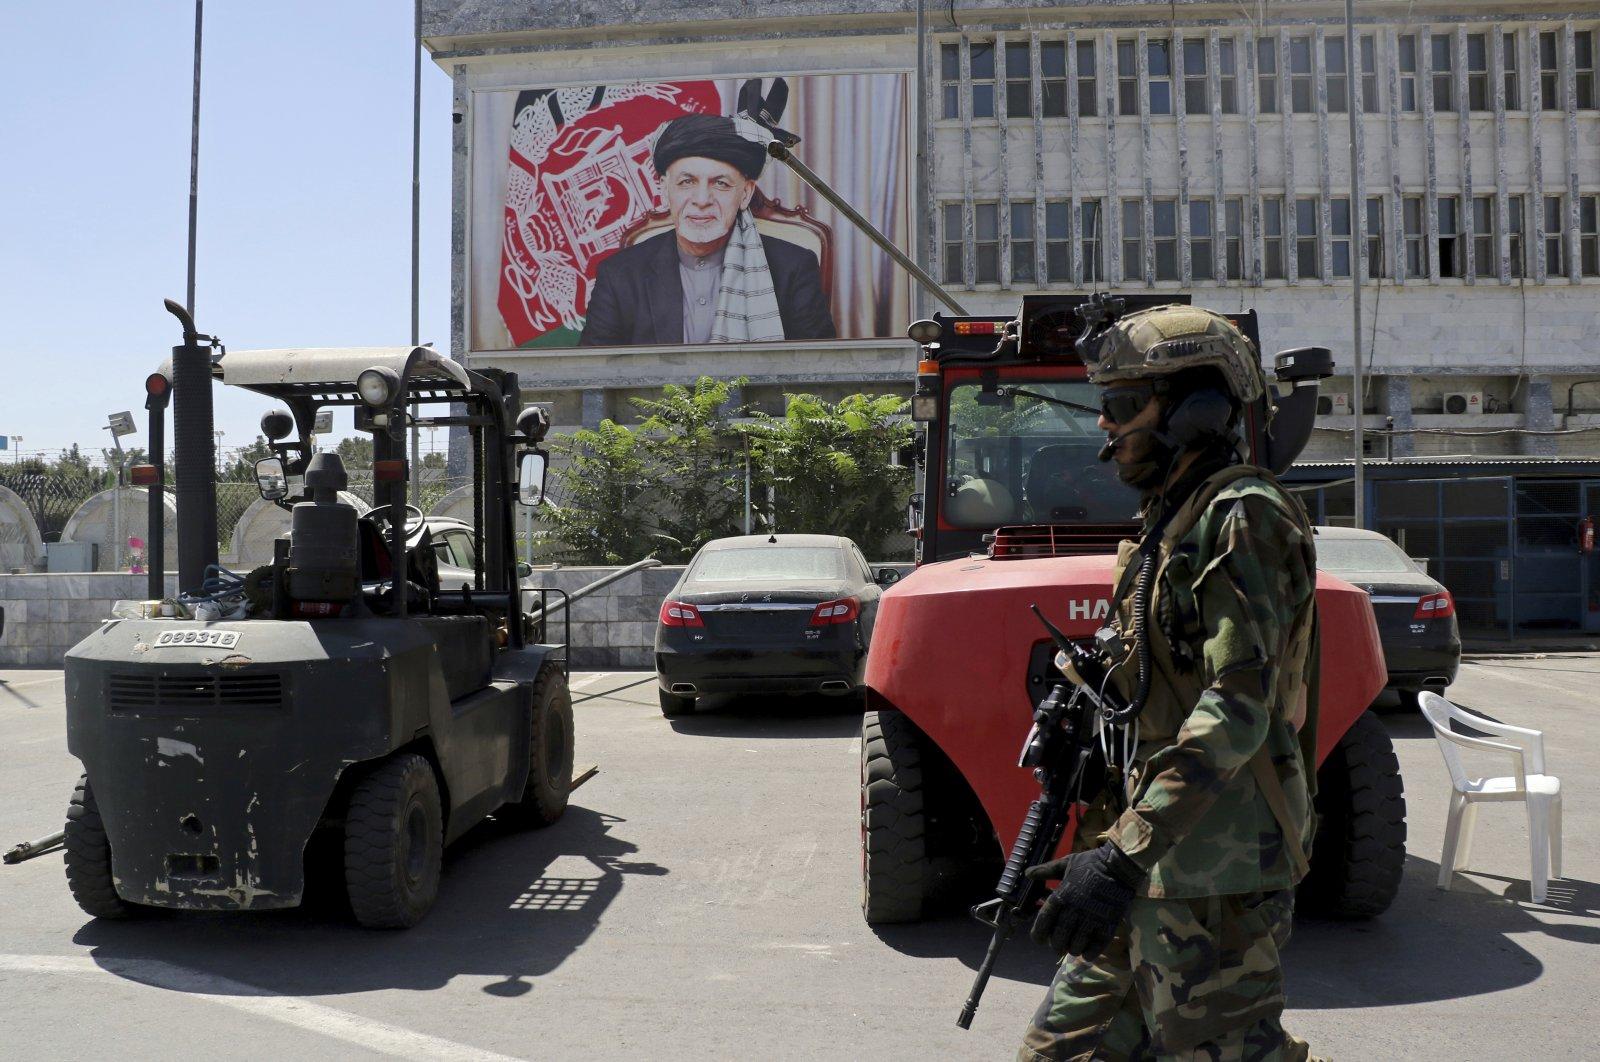 A Taliban soldier patrols at Hamid Karzai International Airport in Kabul, Afghanistan, Sept. 5, 2021. (AP Photo)